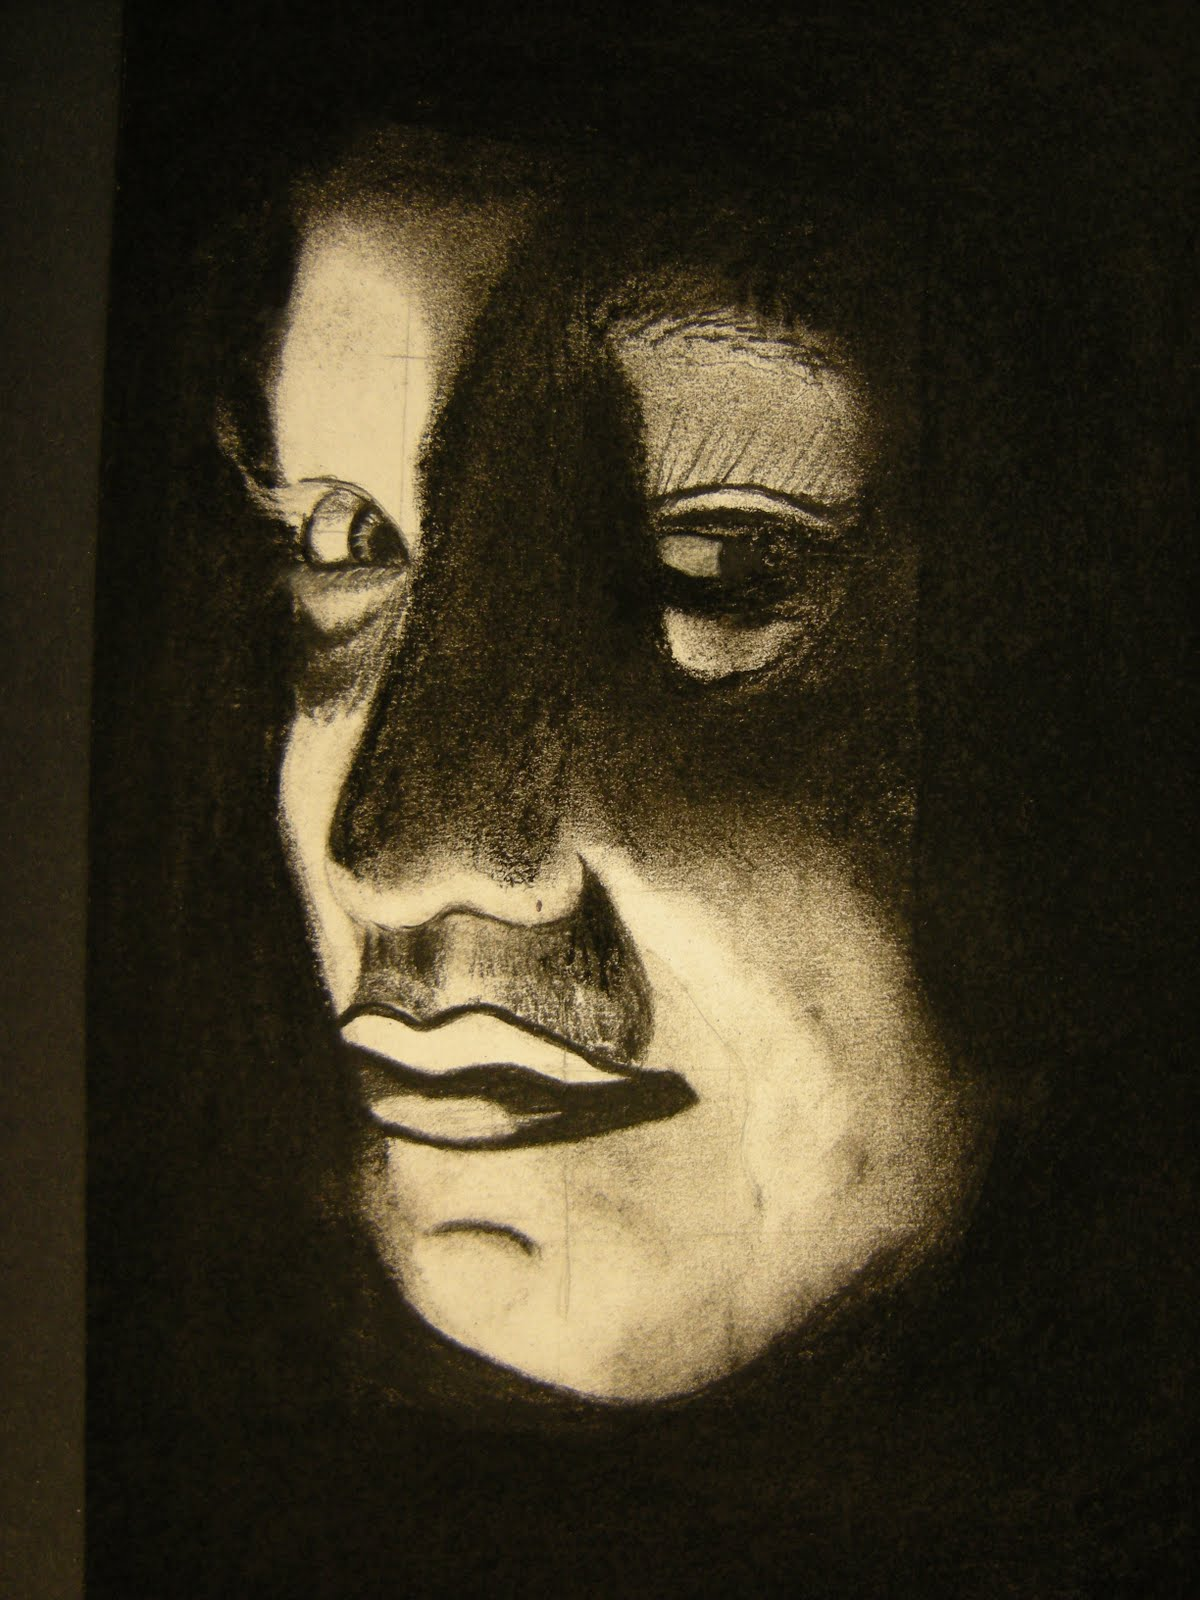 Project 2 Self Portrait: Reflections